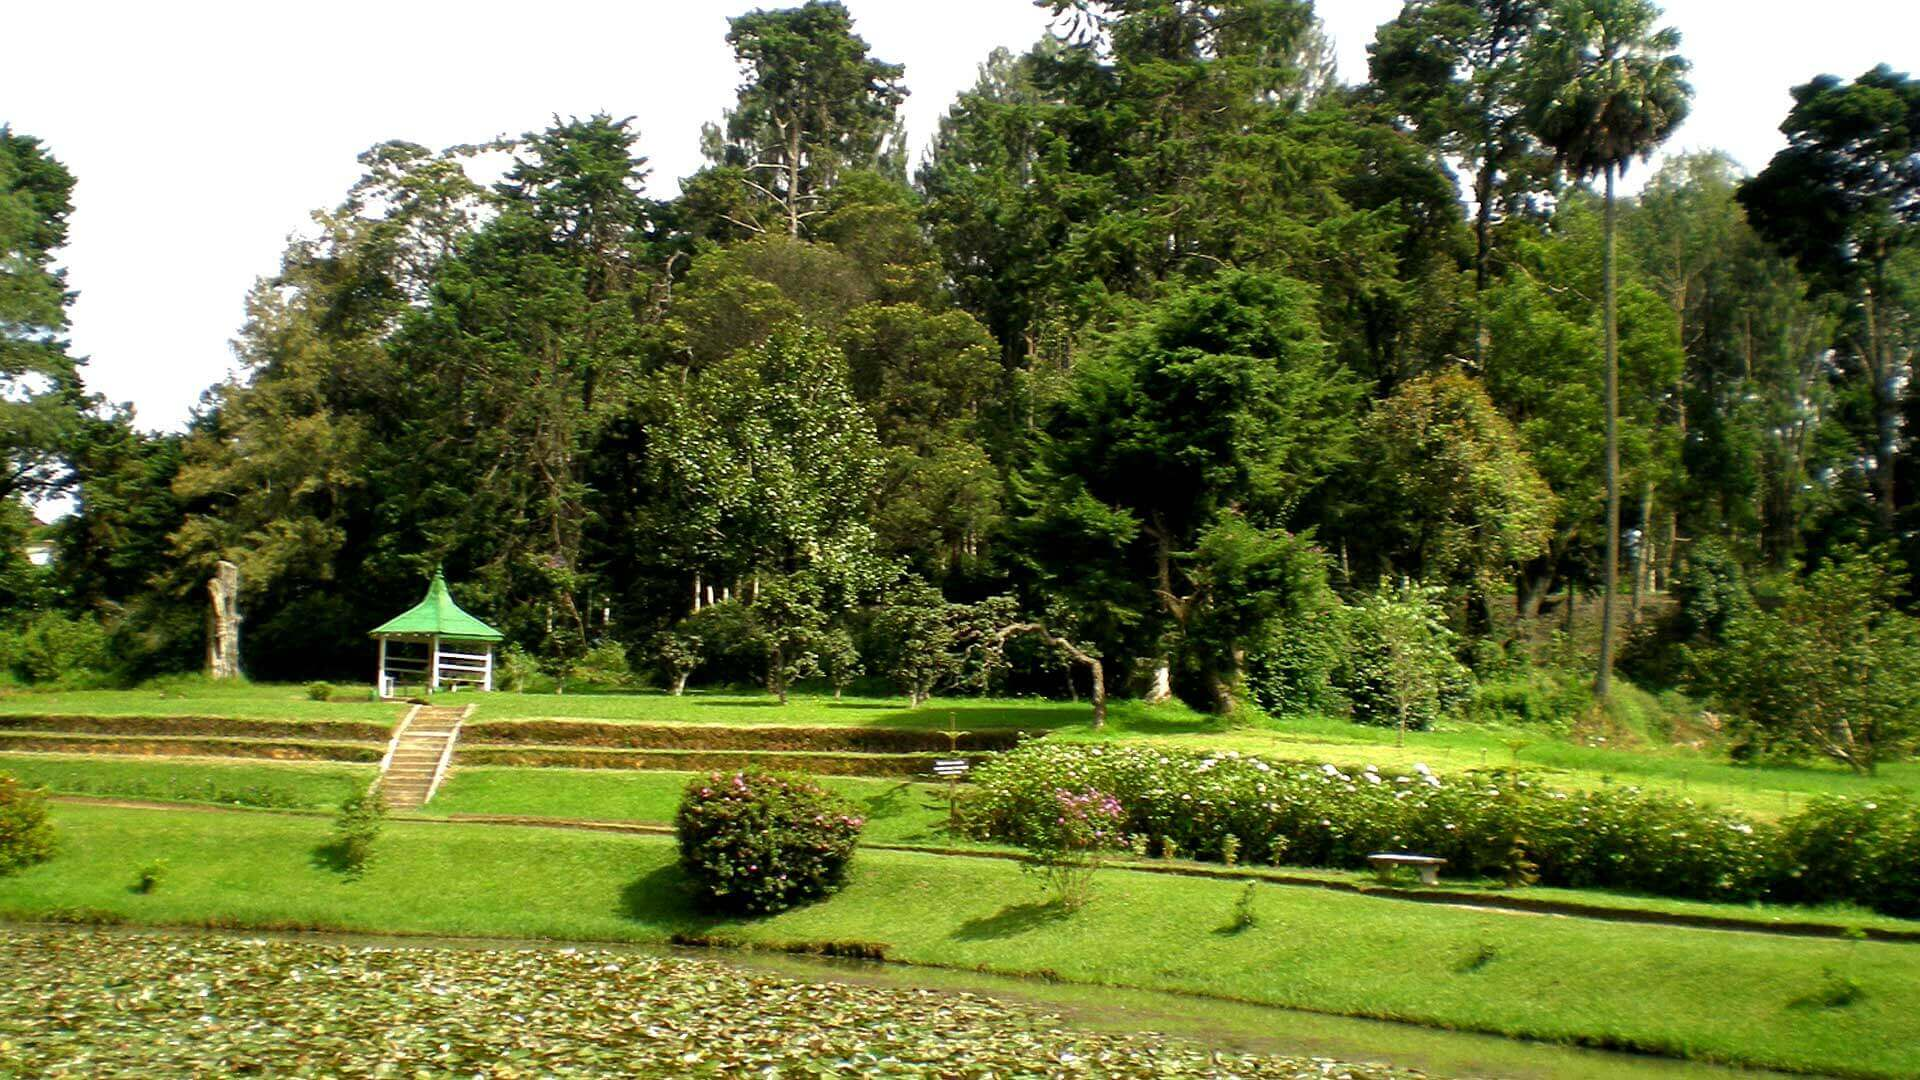 The Golden Ridge - Victoria Park